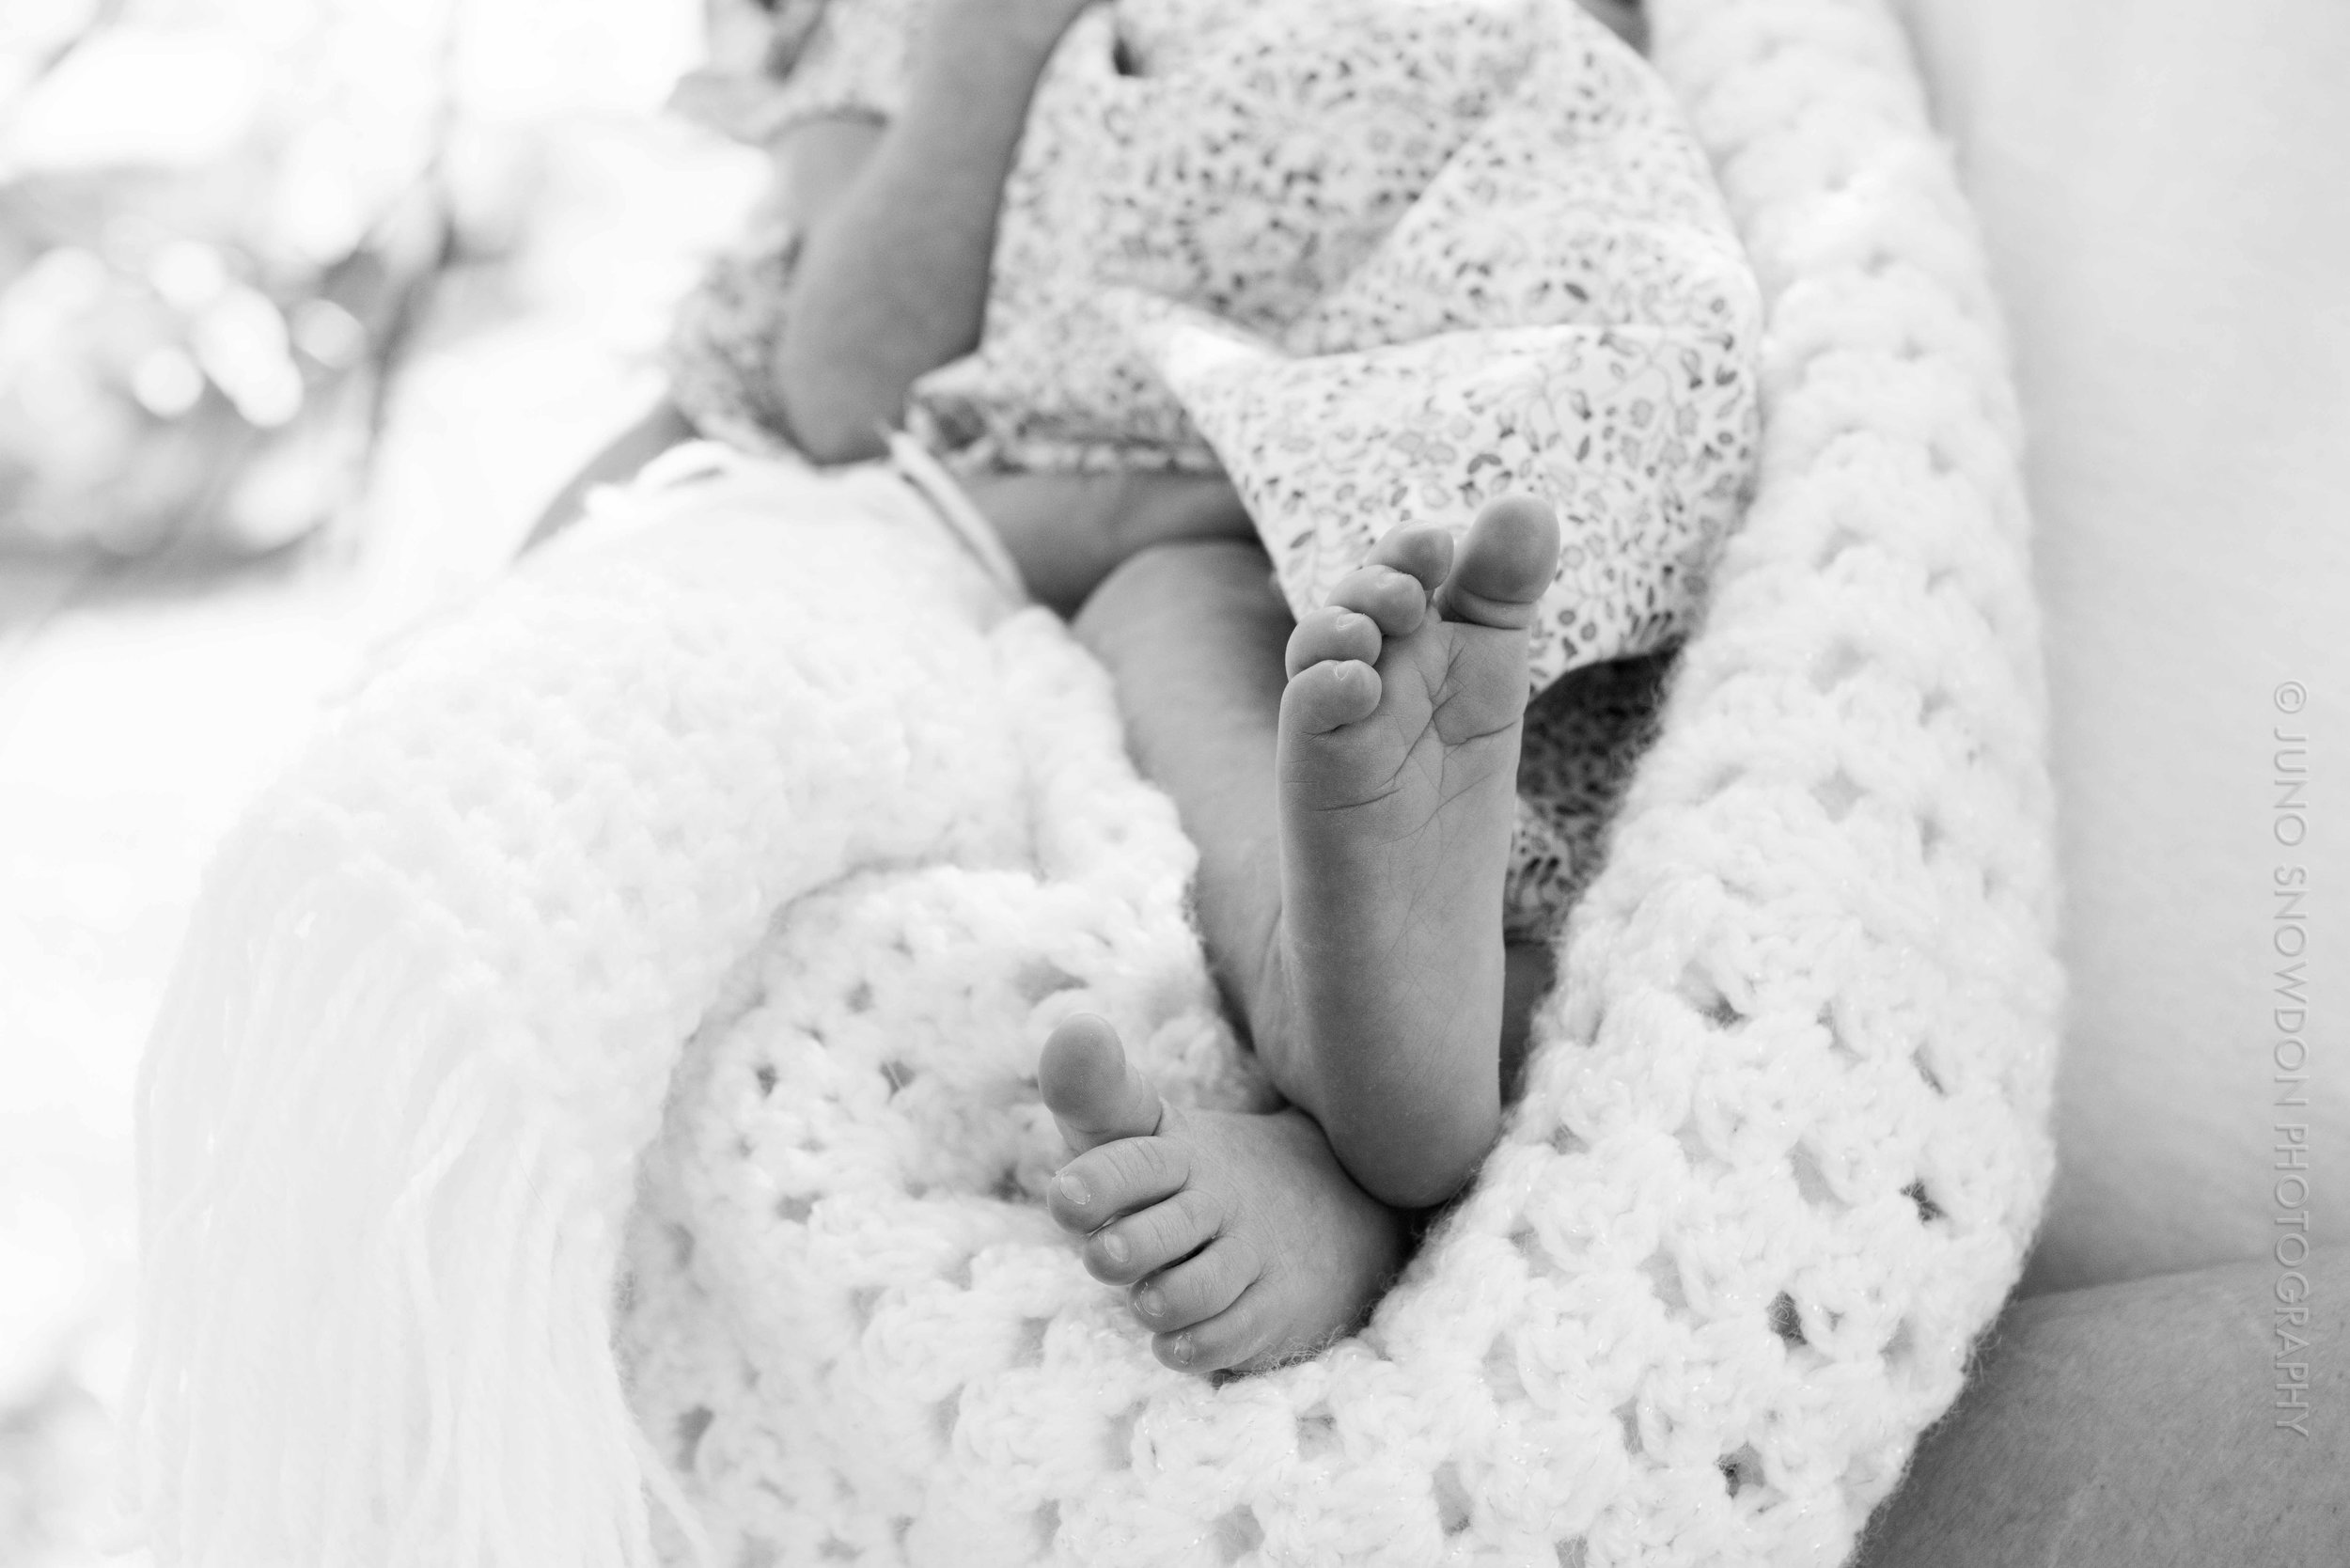 juno-snowdon-photography-newborn-6019.jpg